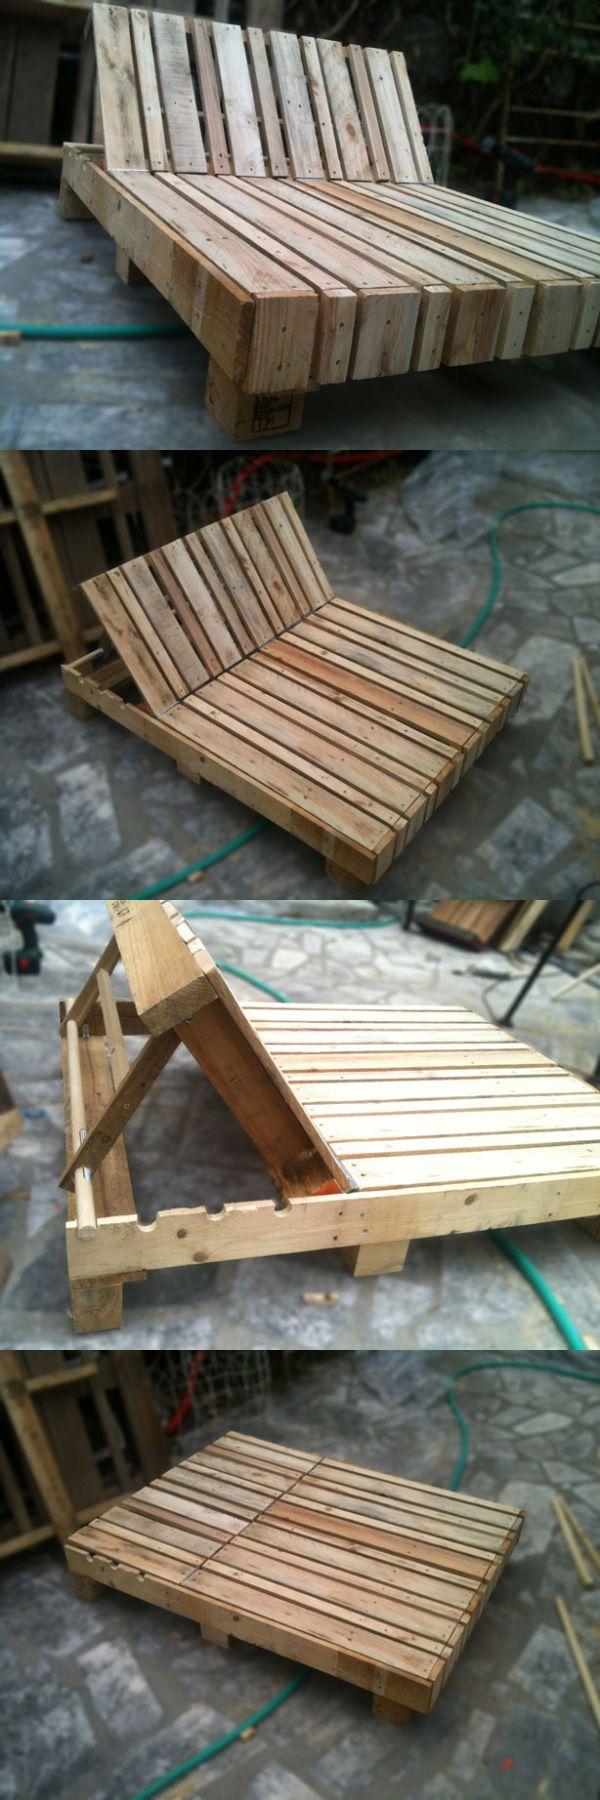 double pallet lounge chair | garden design | pinterest | meubels